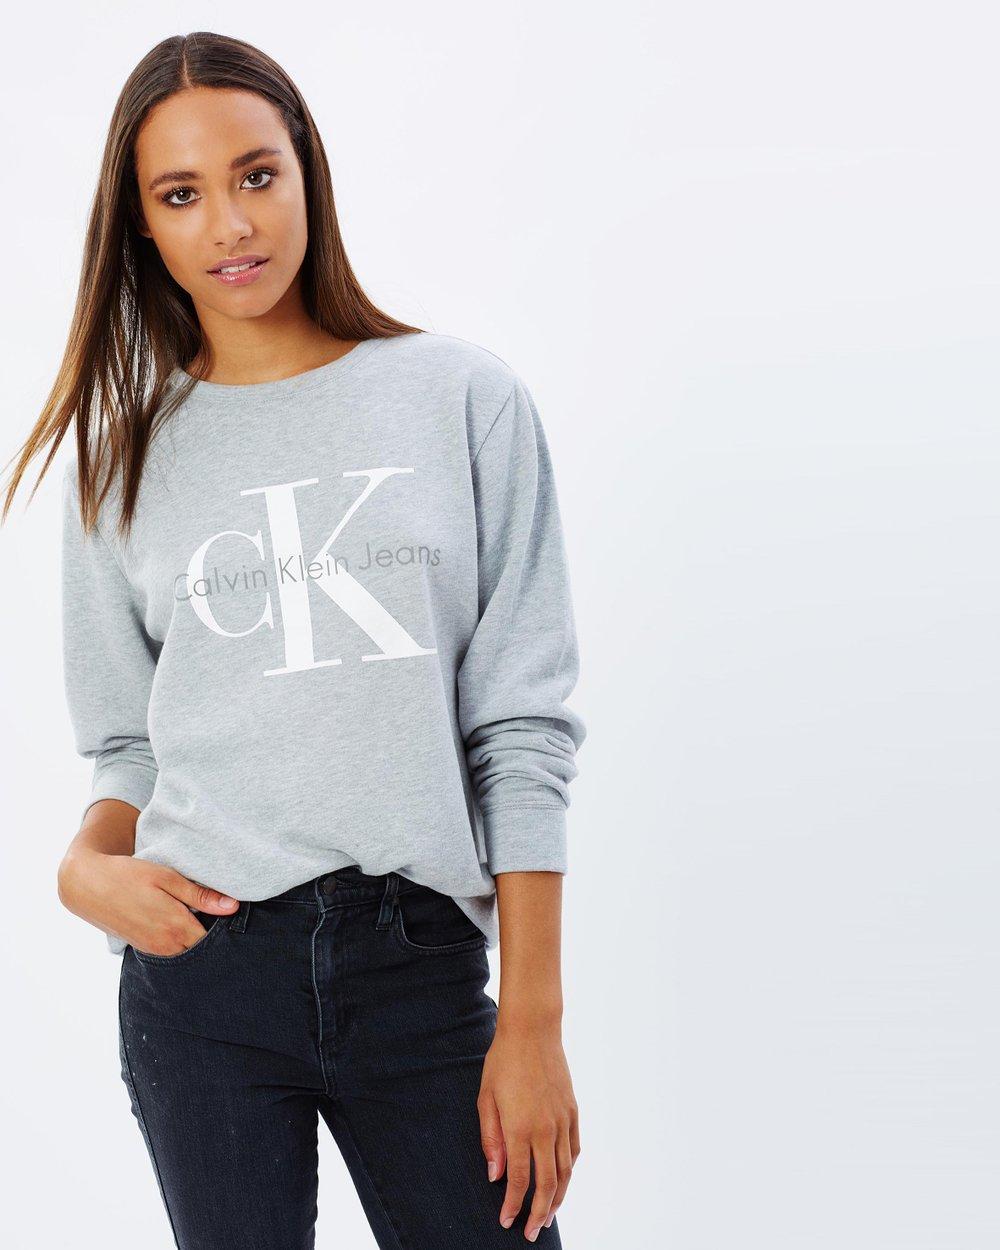 c4fd165f8fe Urban CK Logo Sweatshirt by Calvin Klein Jeans Online